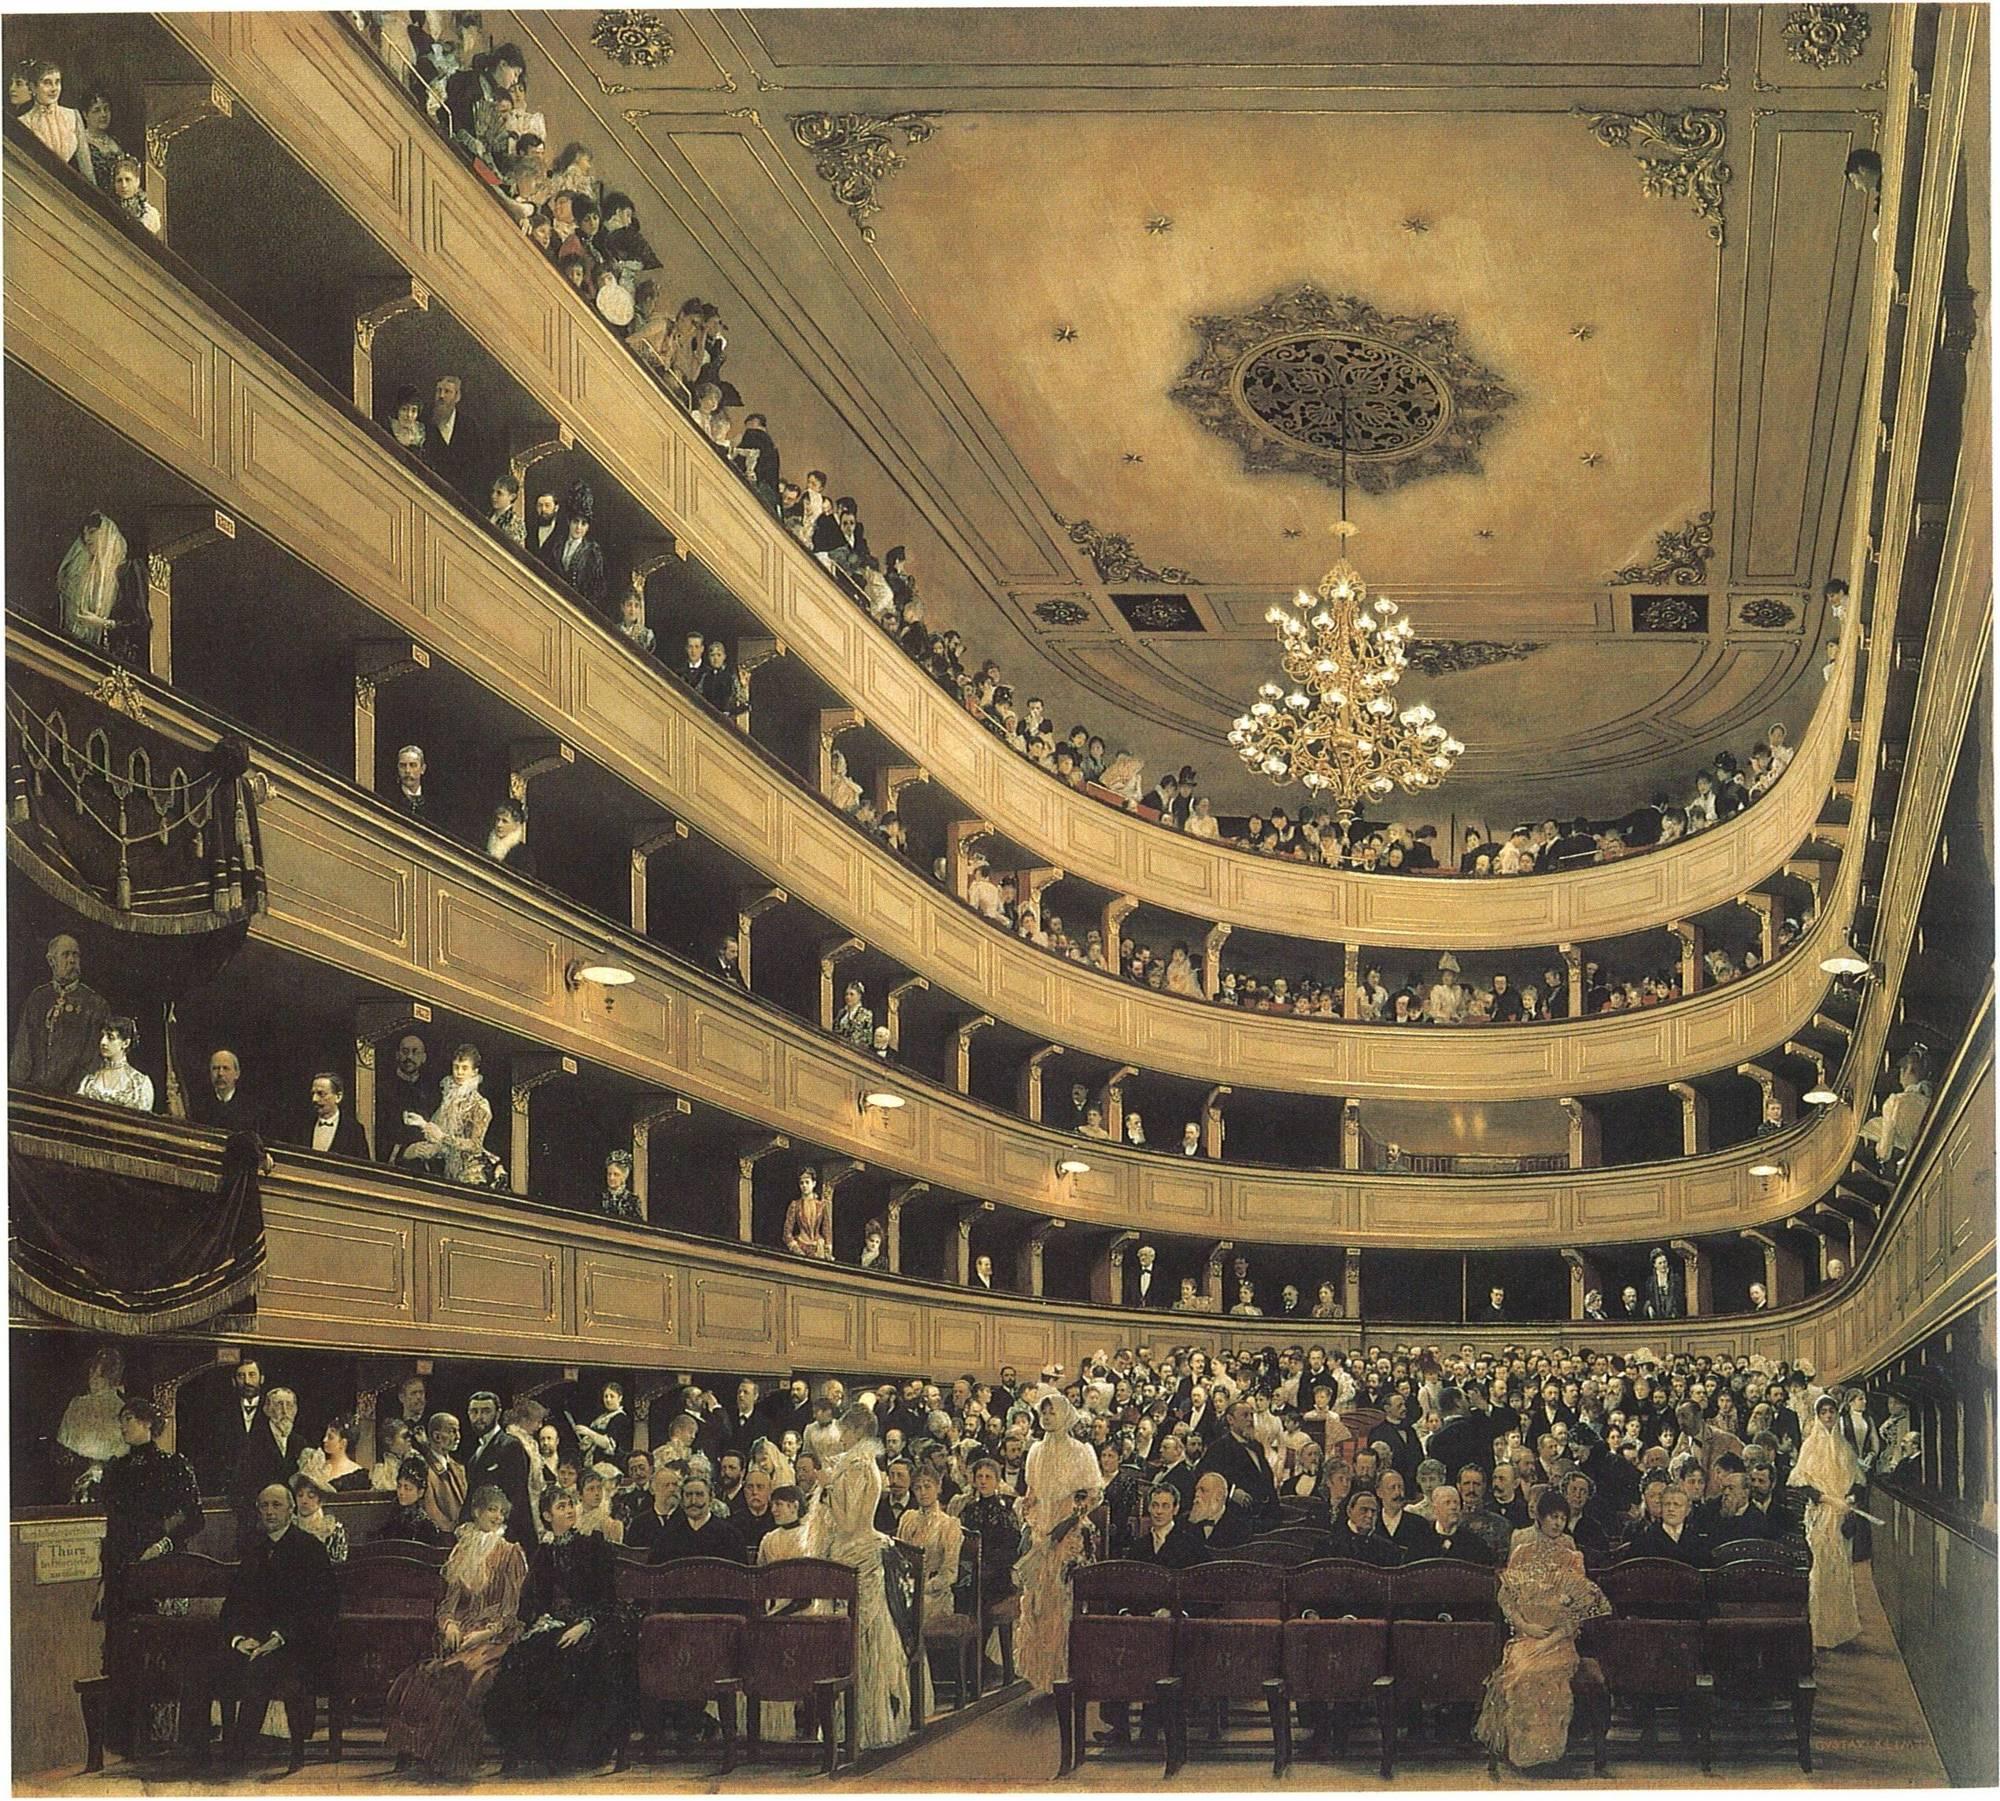 The Burgtheater by Gustav Klimt